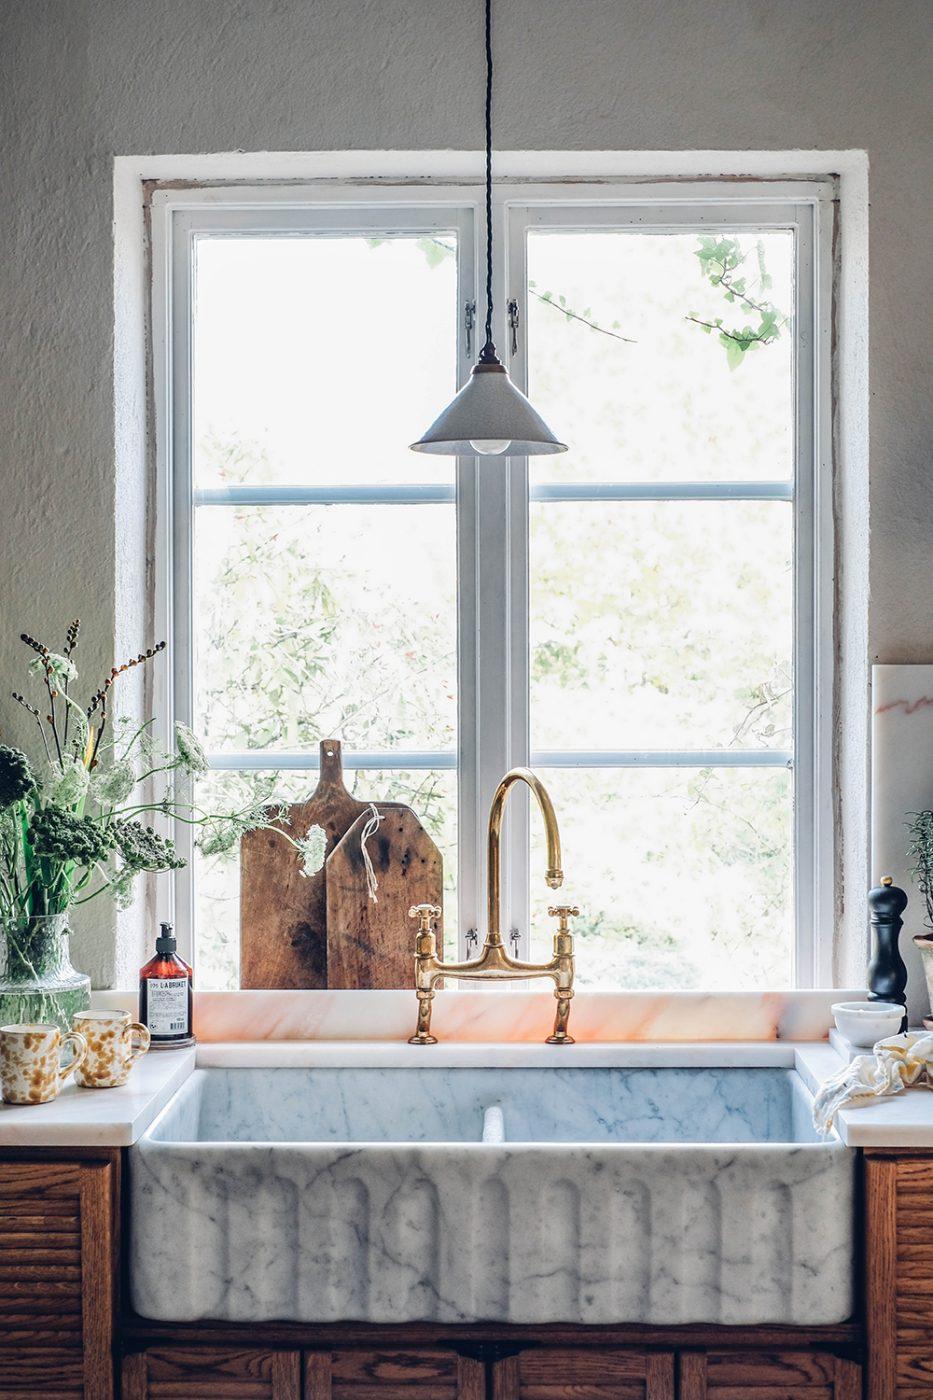 Image for Our Kitchen in Sweden – The Devol Haberdasher Kitchen